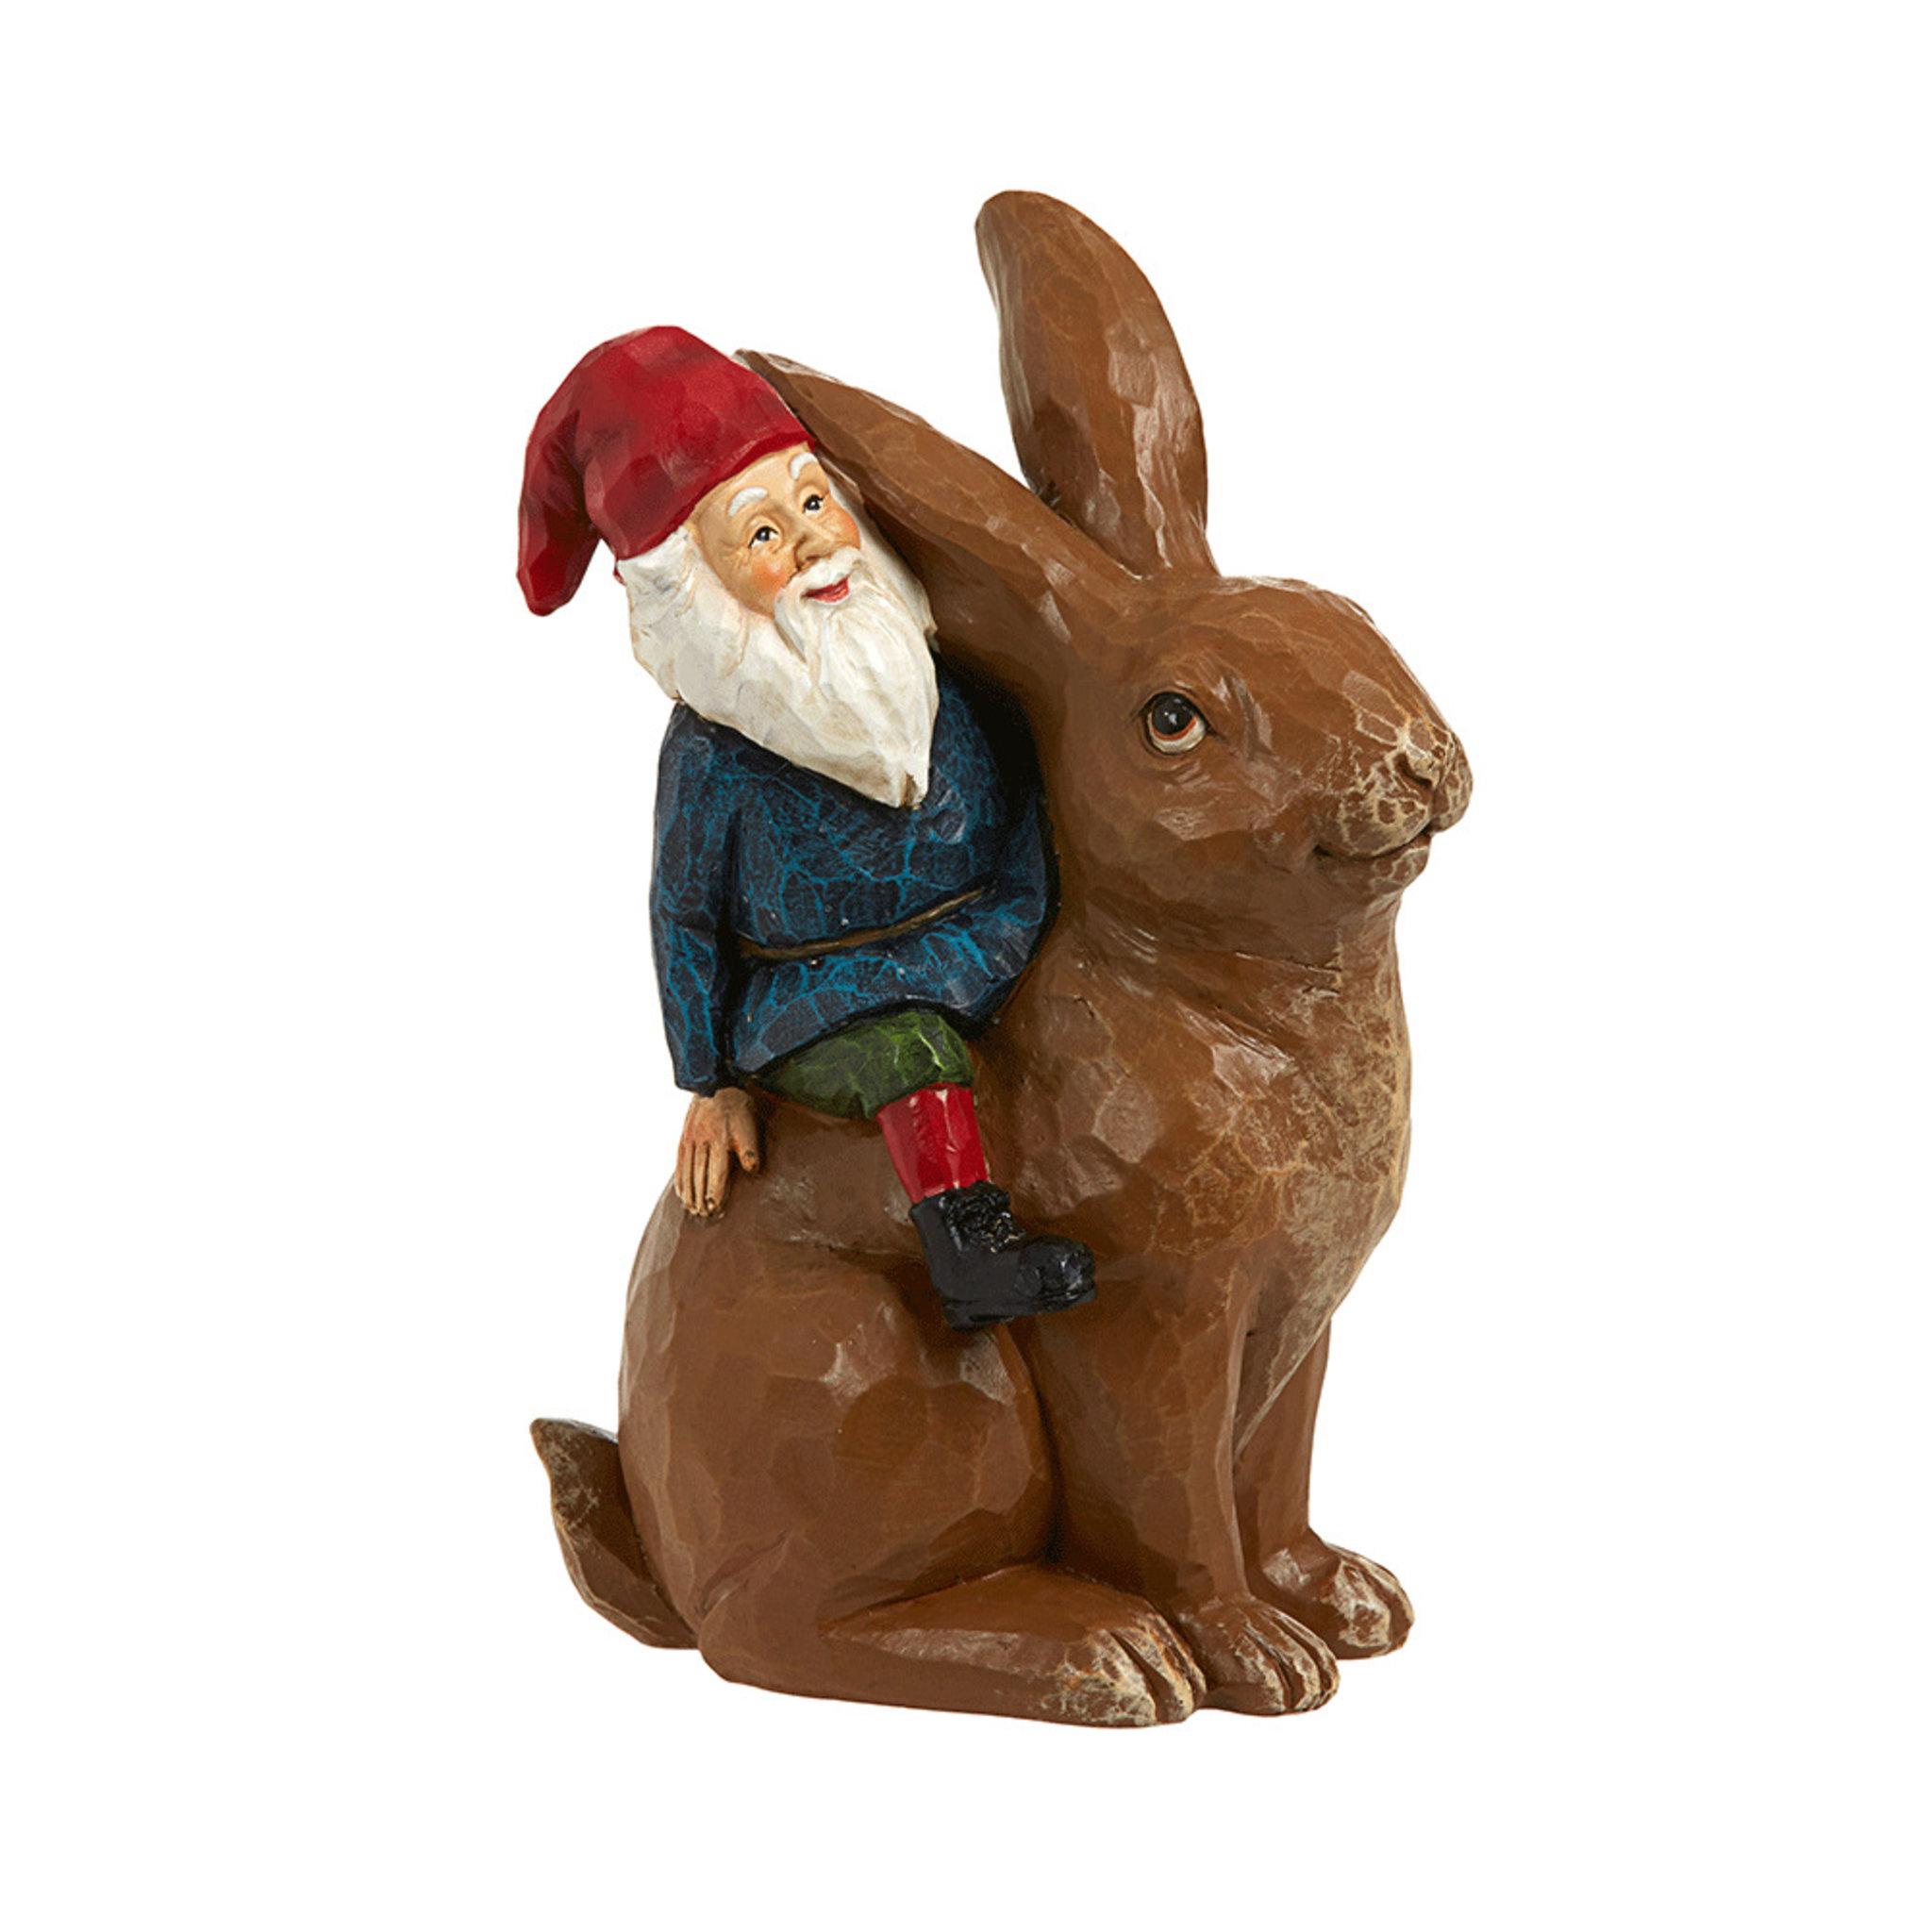 Juldekoration tomte & kanin 16 cm